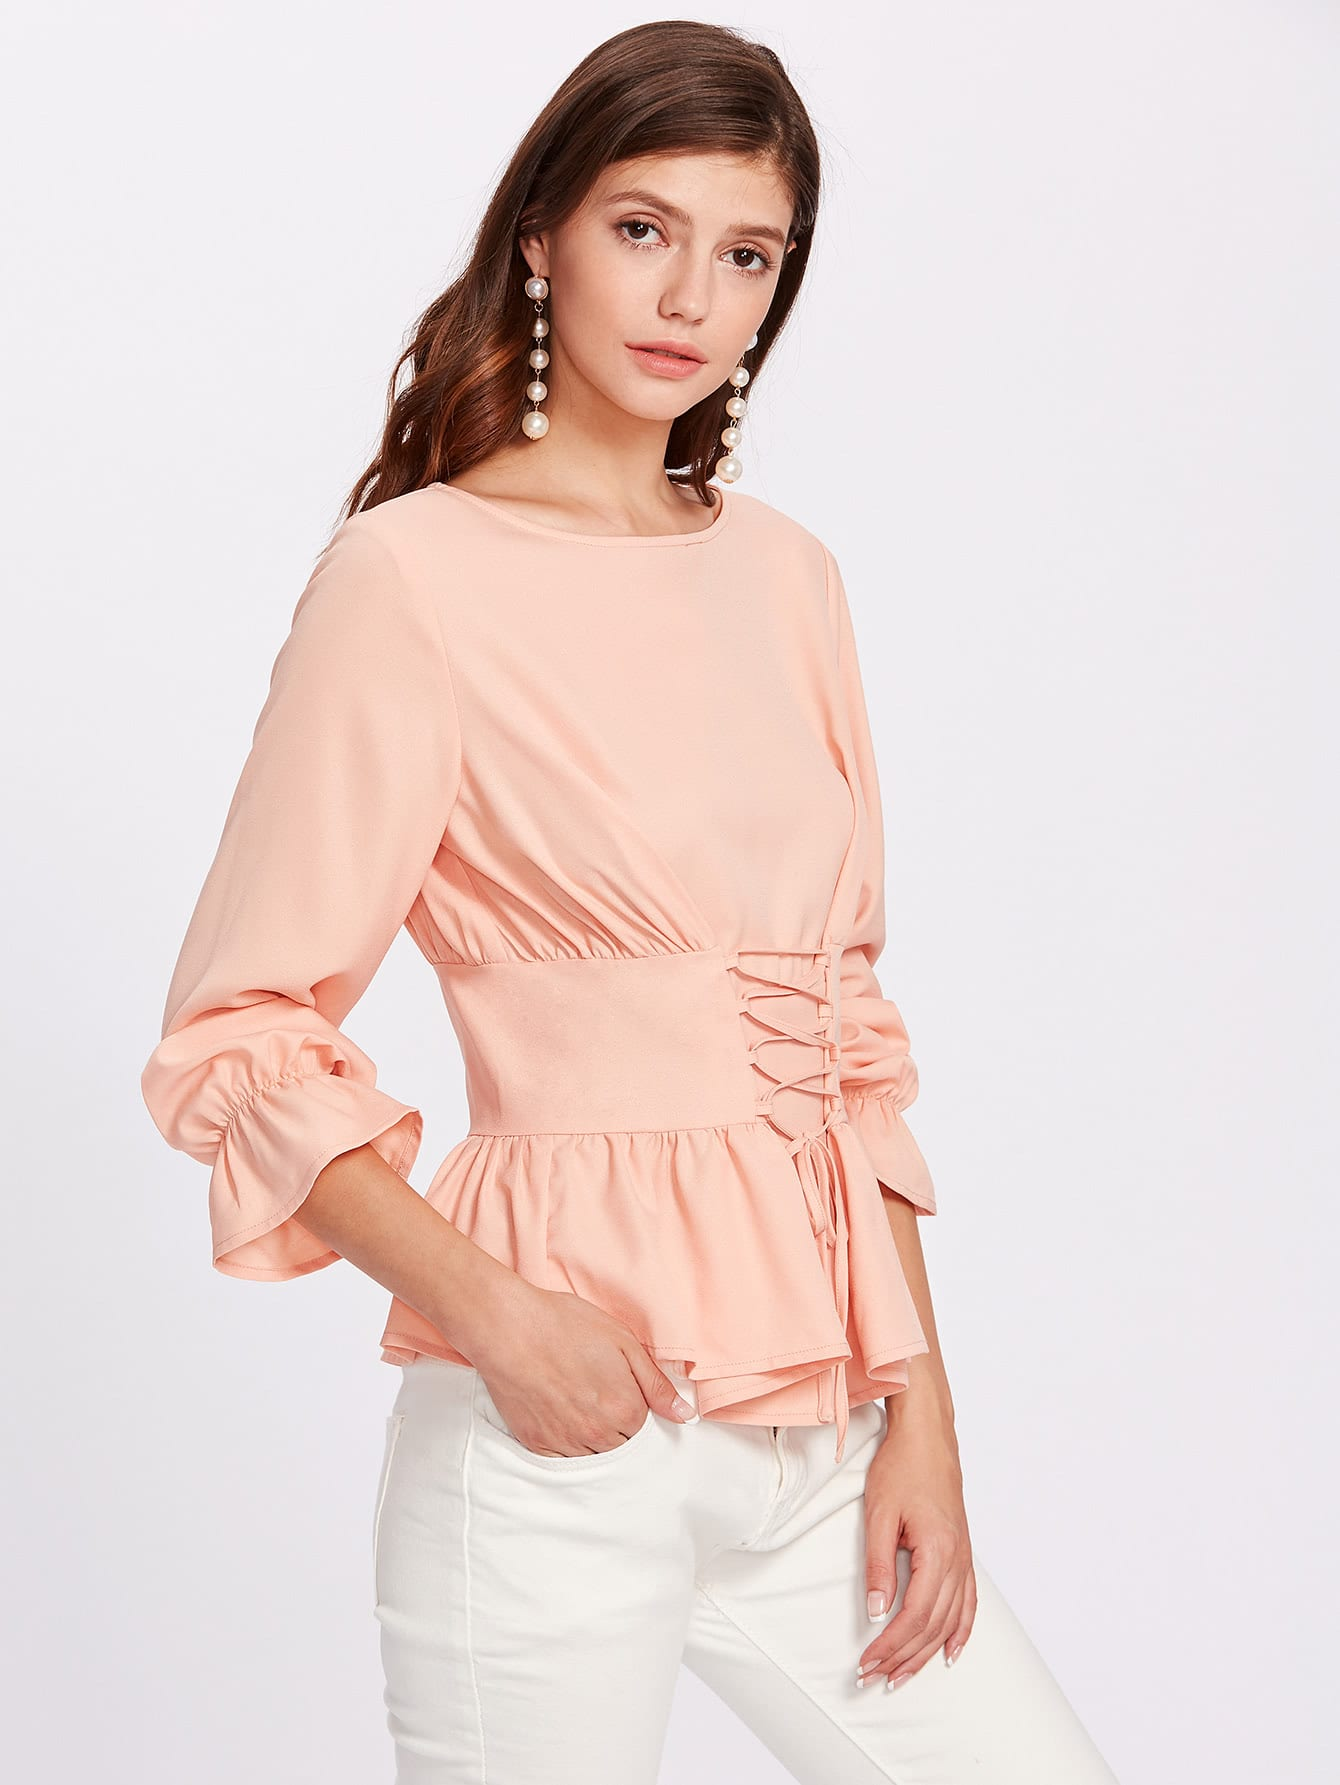 Bell Cuff Lace Up Peplum Top blouse170719705